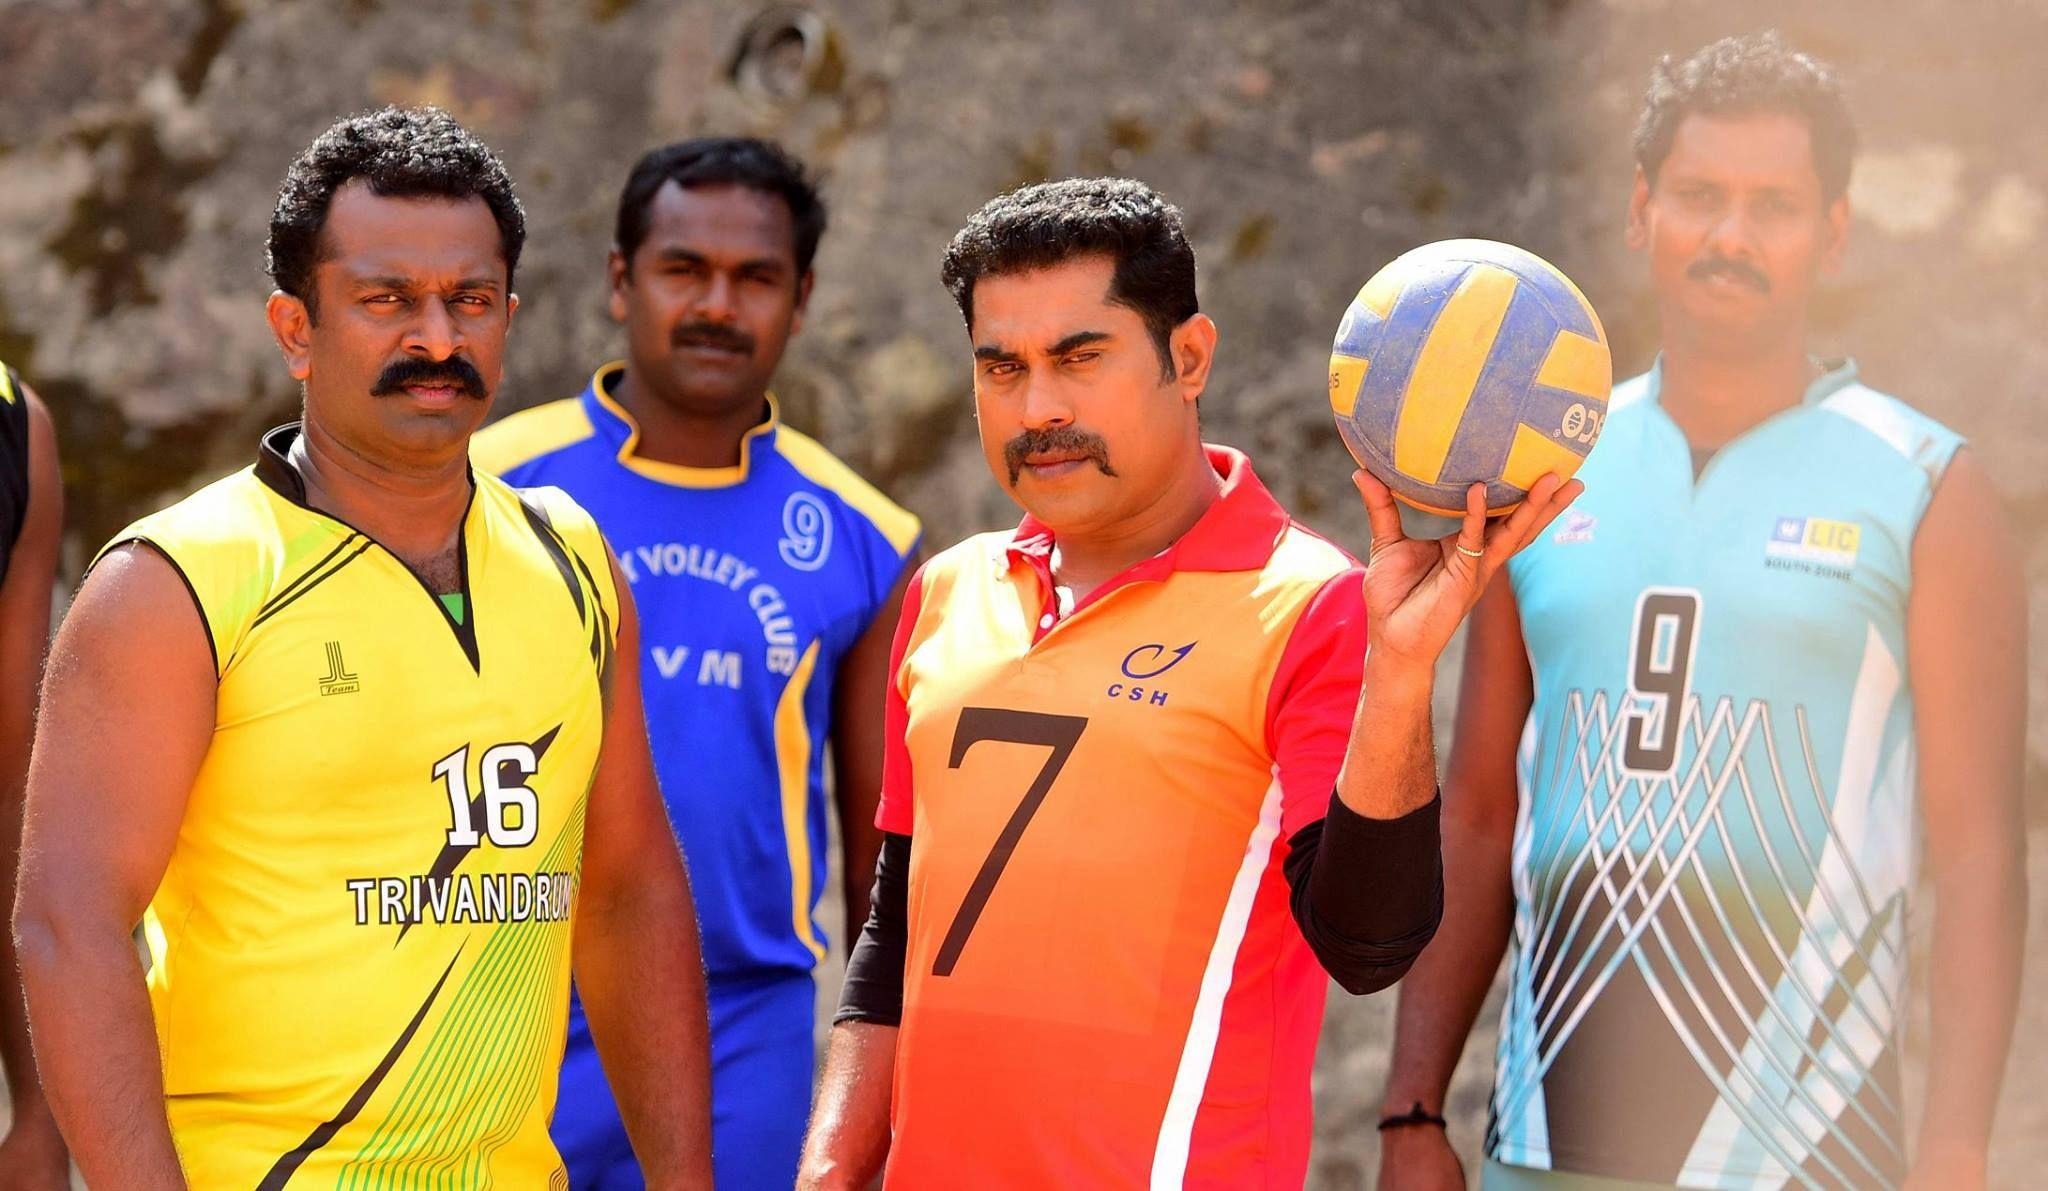 Sreejith Ravi And Suraaj Venjaranmoodu 2935 Karinkunnam Sixes Movie Gallery Babu Anthony Manju Warrier Movies Anthony Sports Jersey